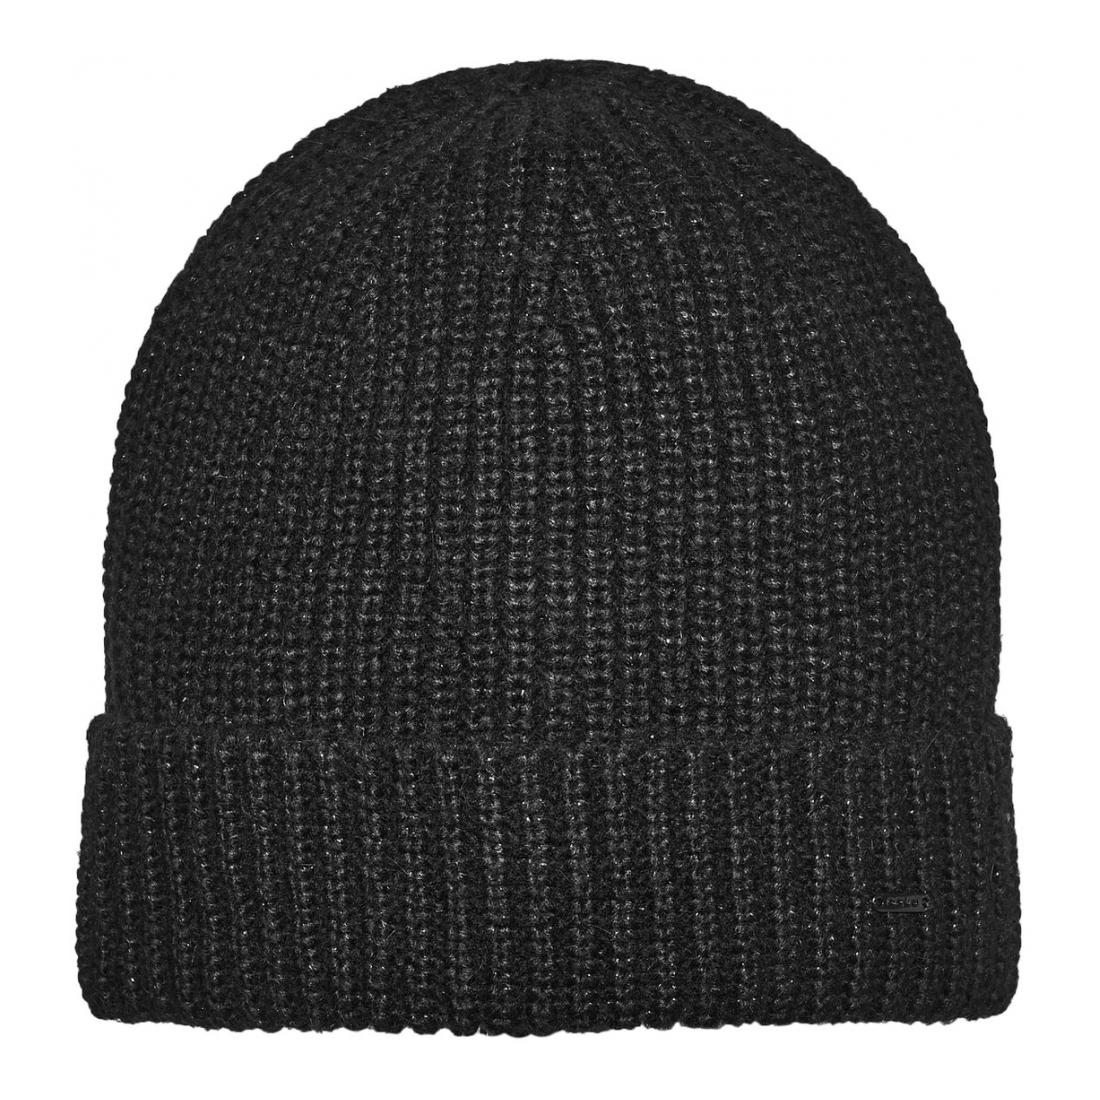 Opus Mützen Stirnband/Handschuhe Afiti cap